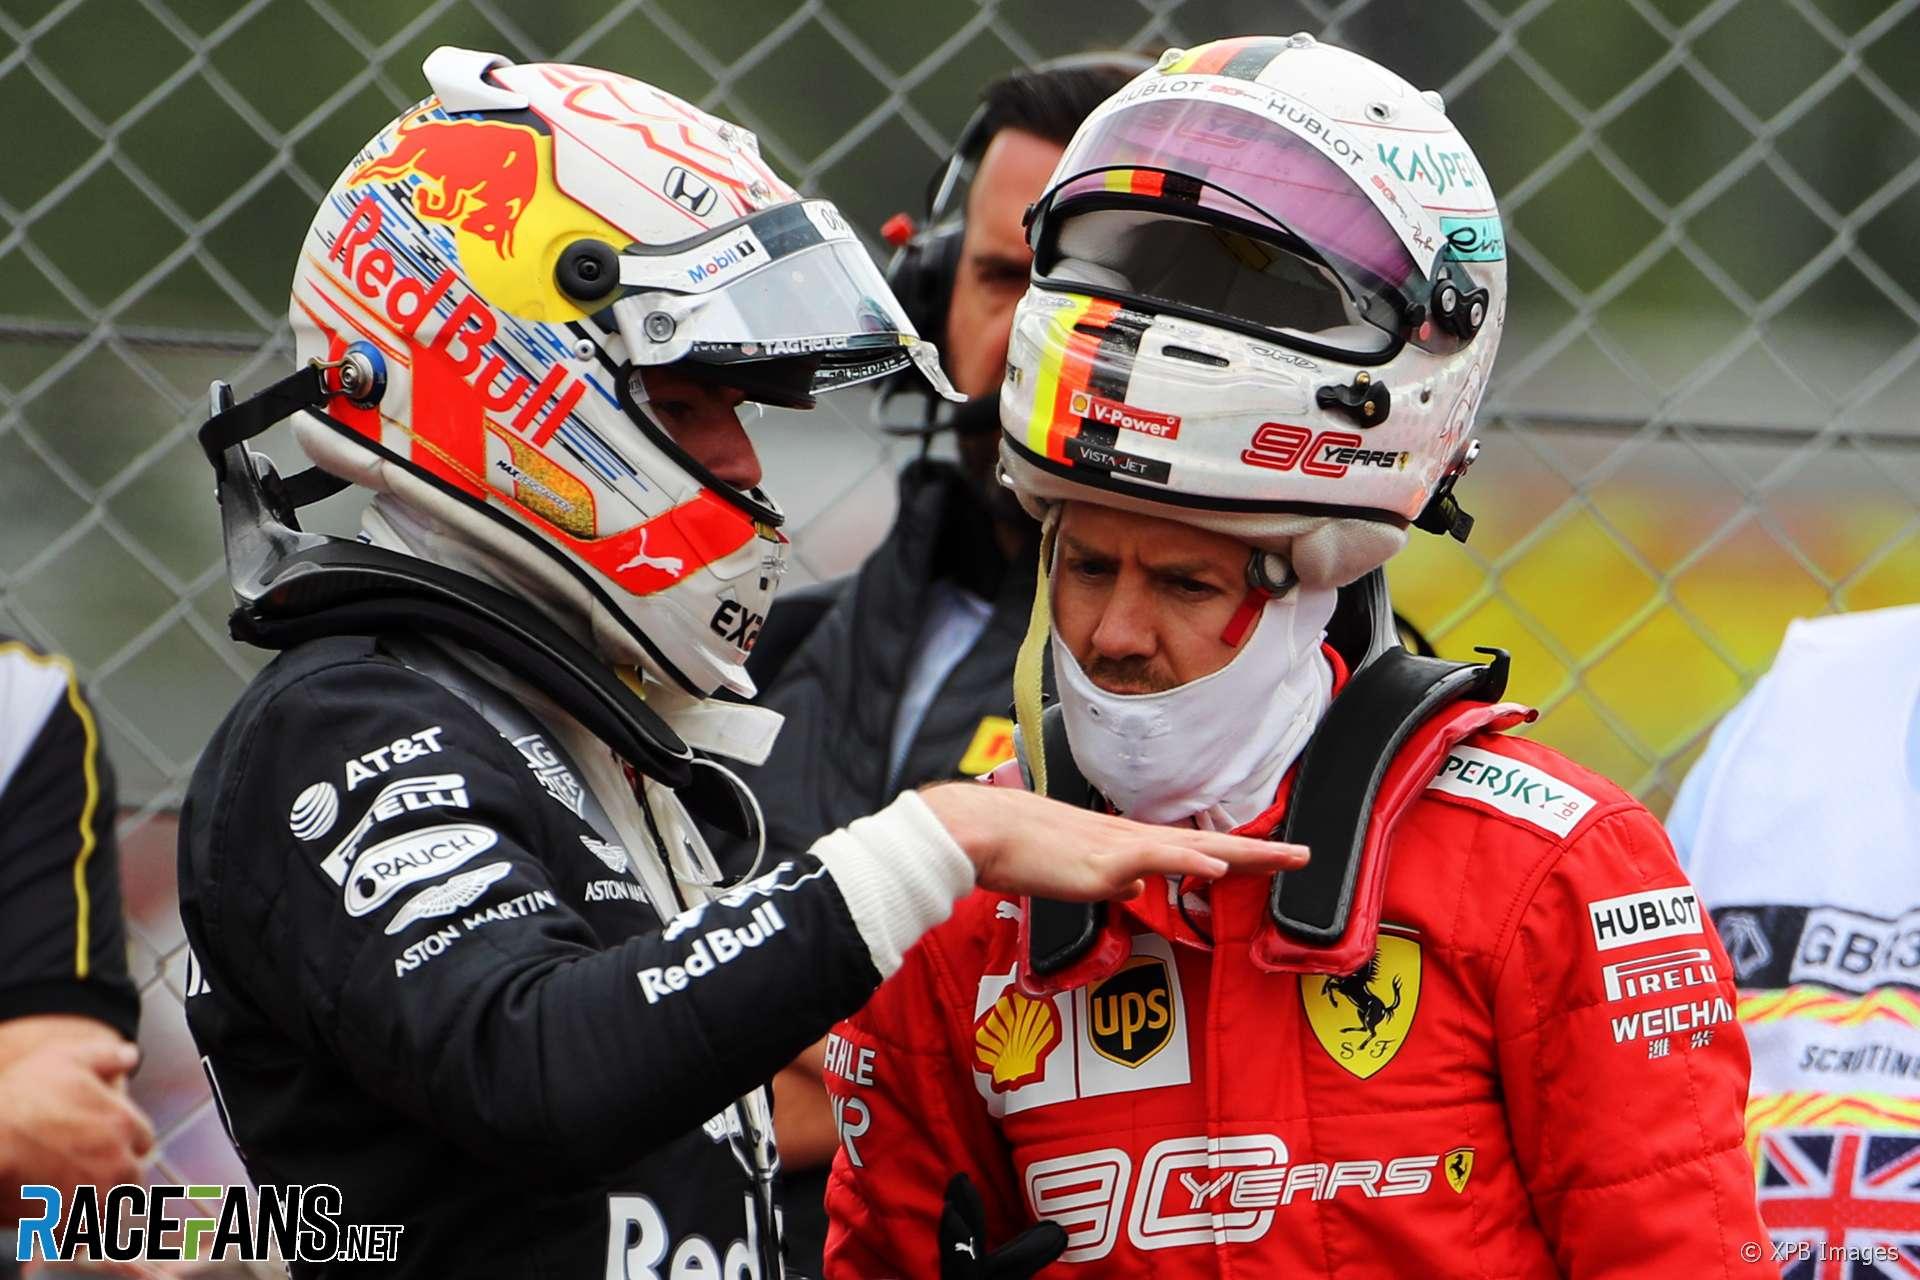 Caption Competition 154: Verstappen and Vettel